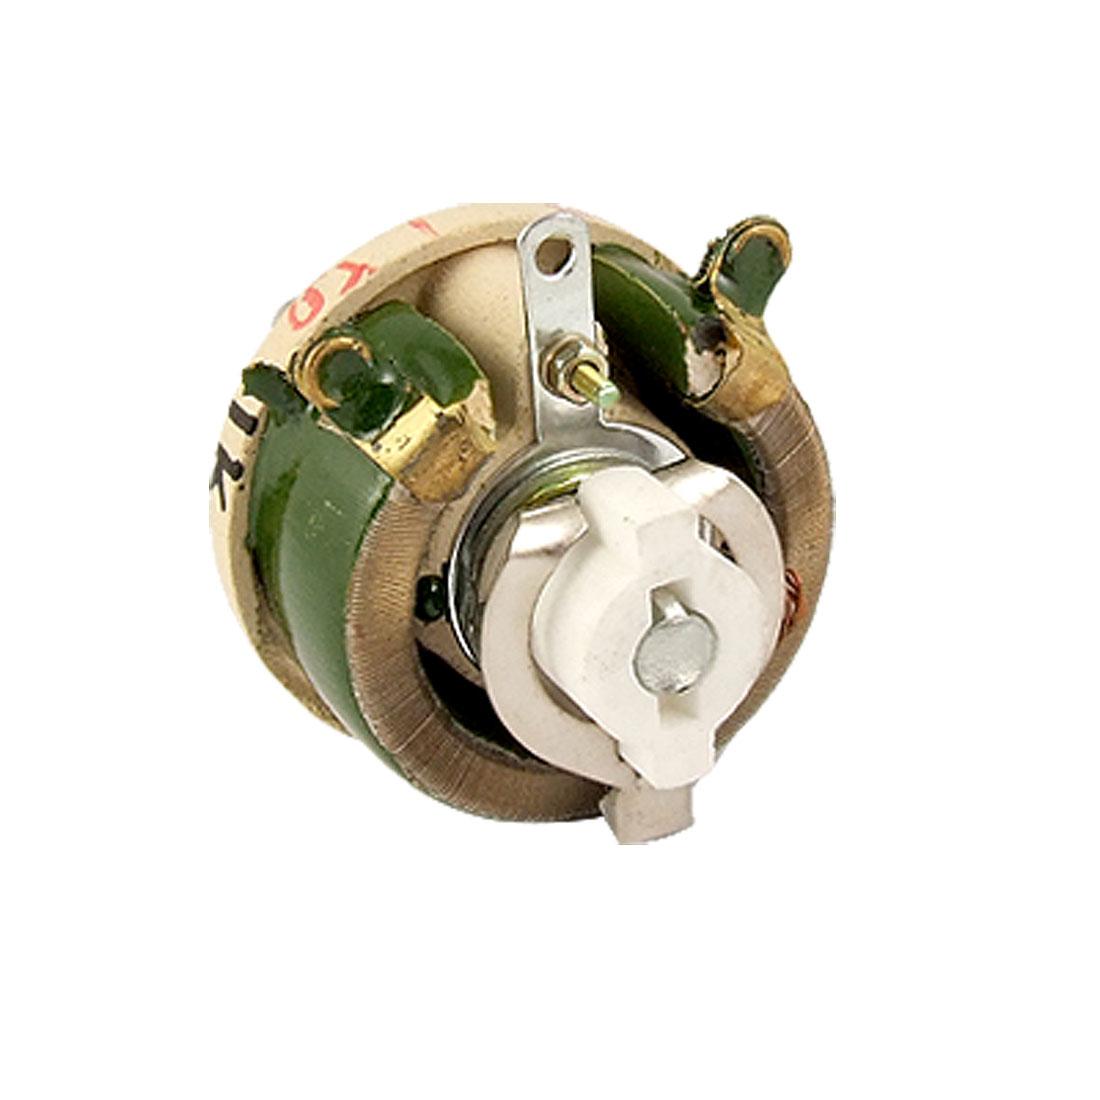 25W 10 Ohm Ceramic Wirewound Variable Resistor Rheostat